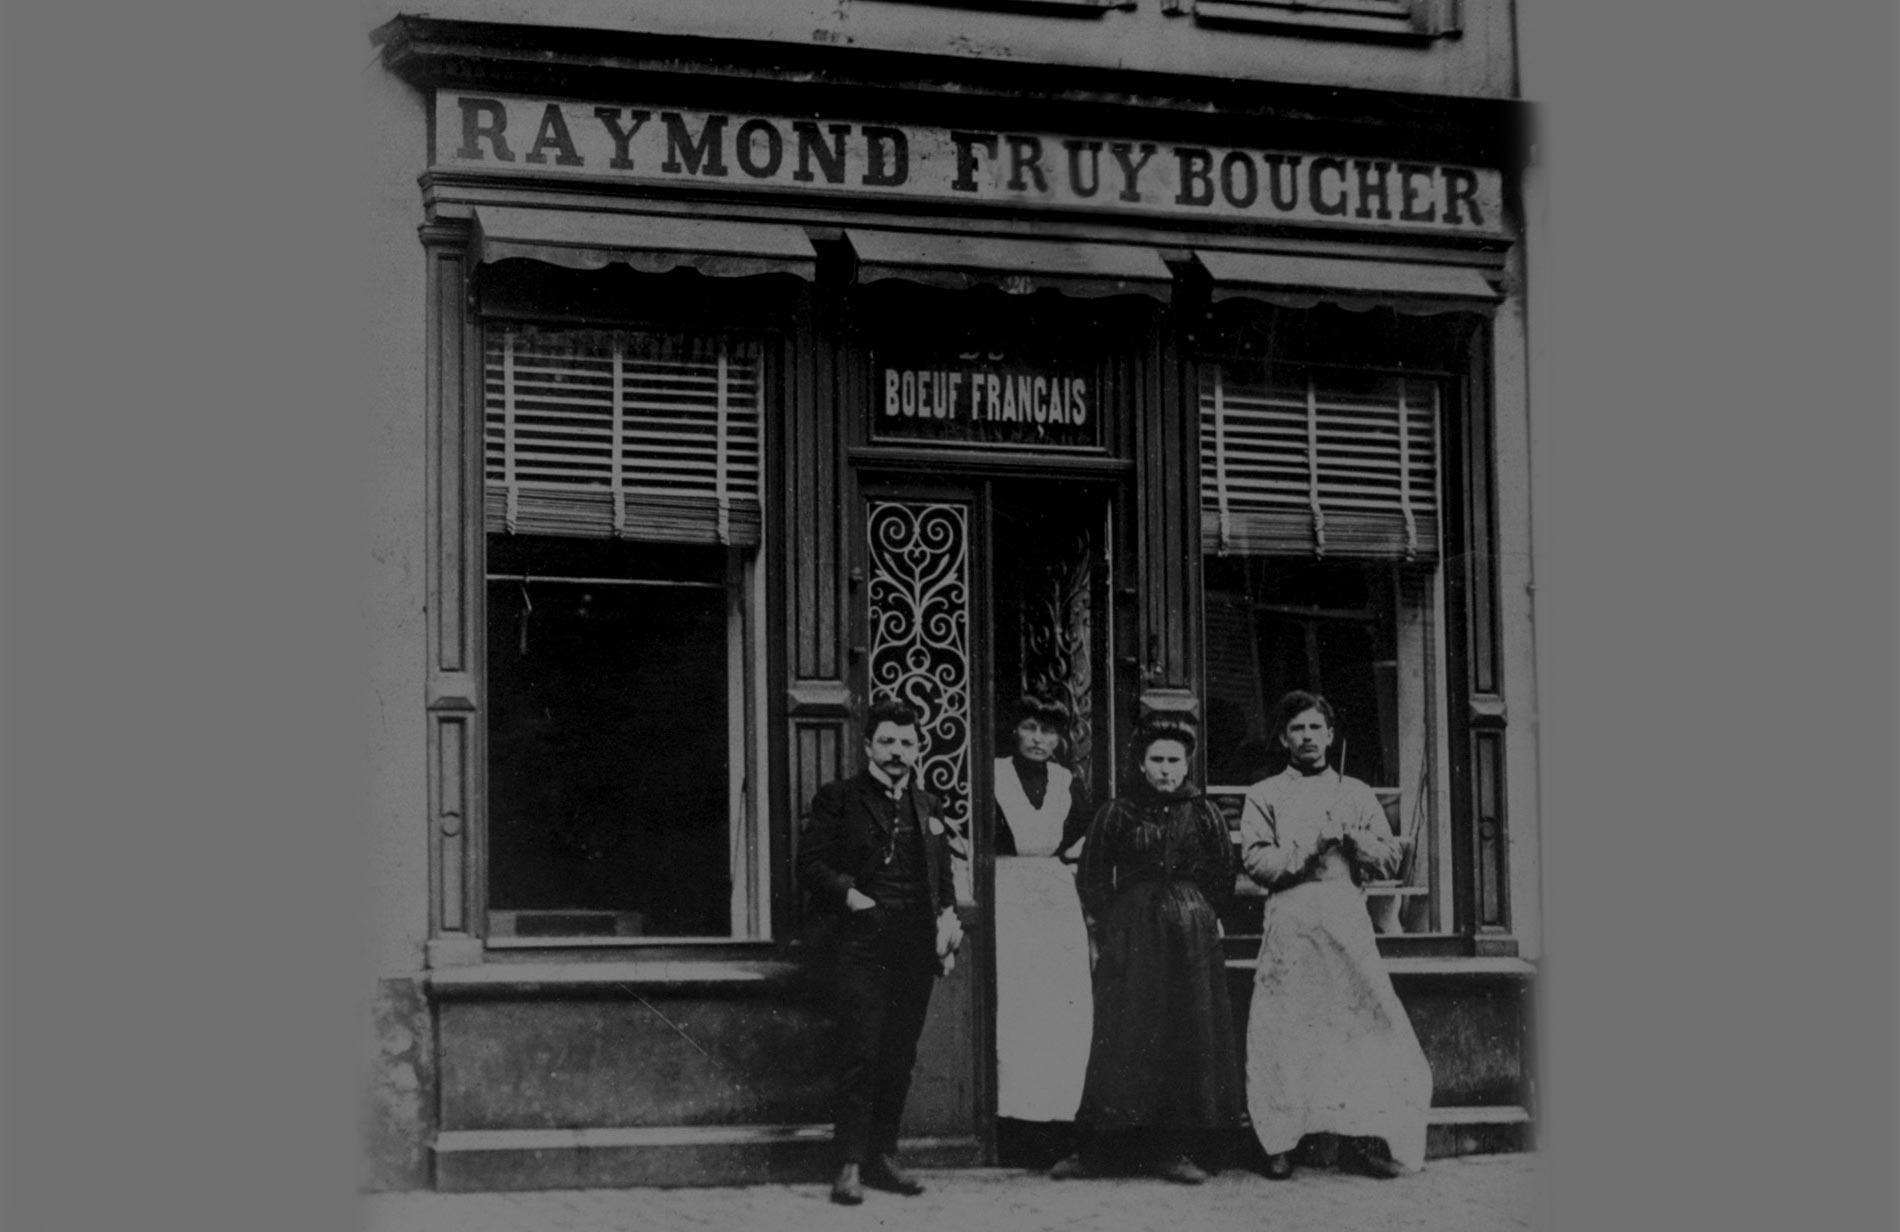 Raymond-Fruy-kortrijk